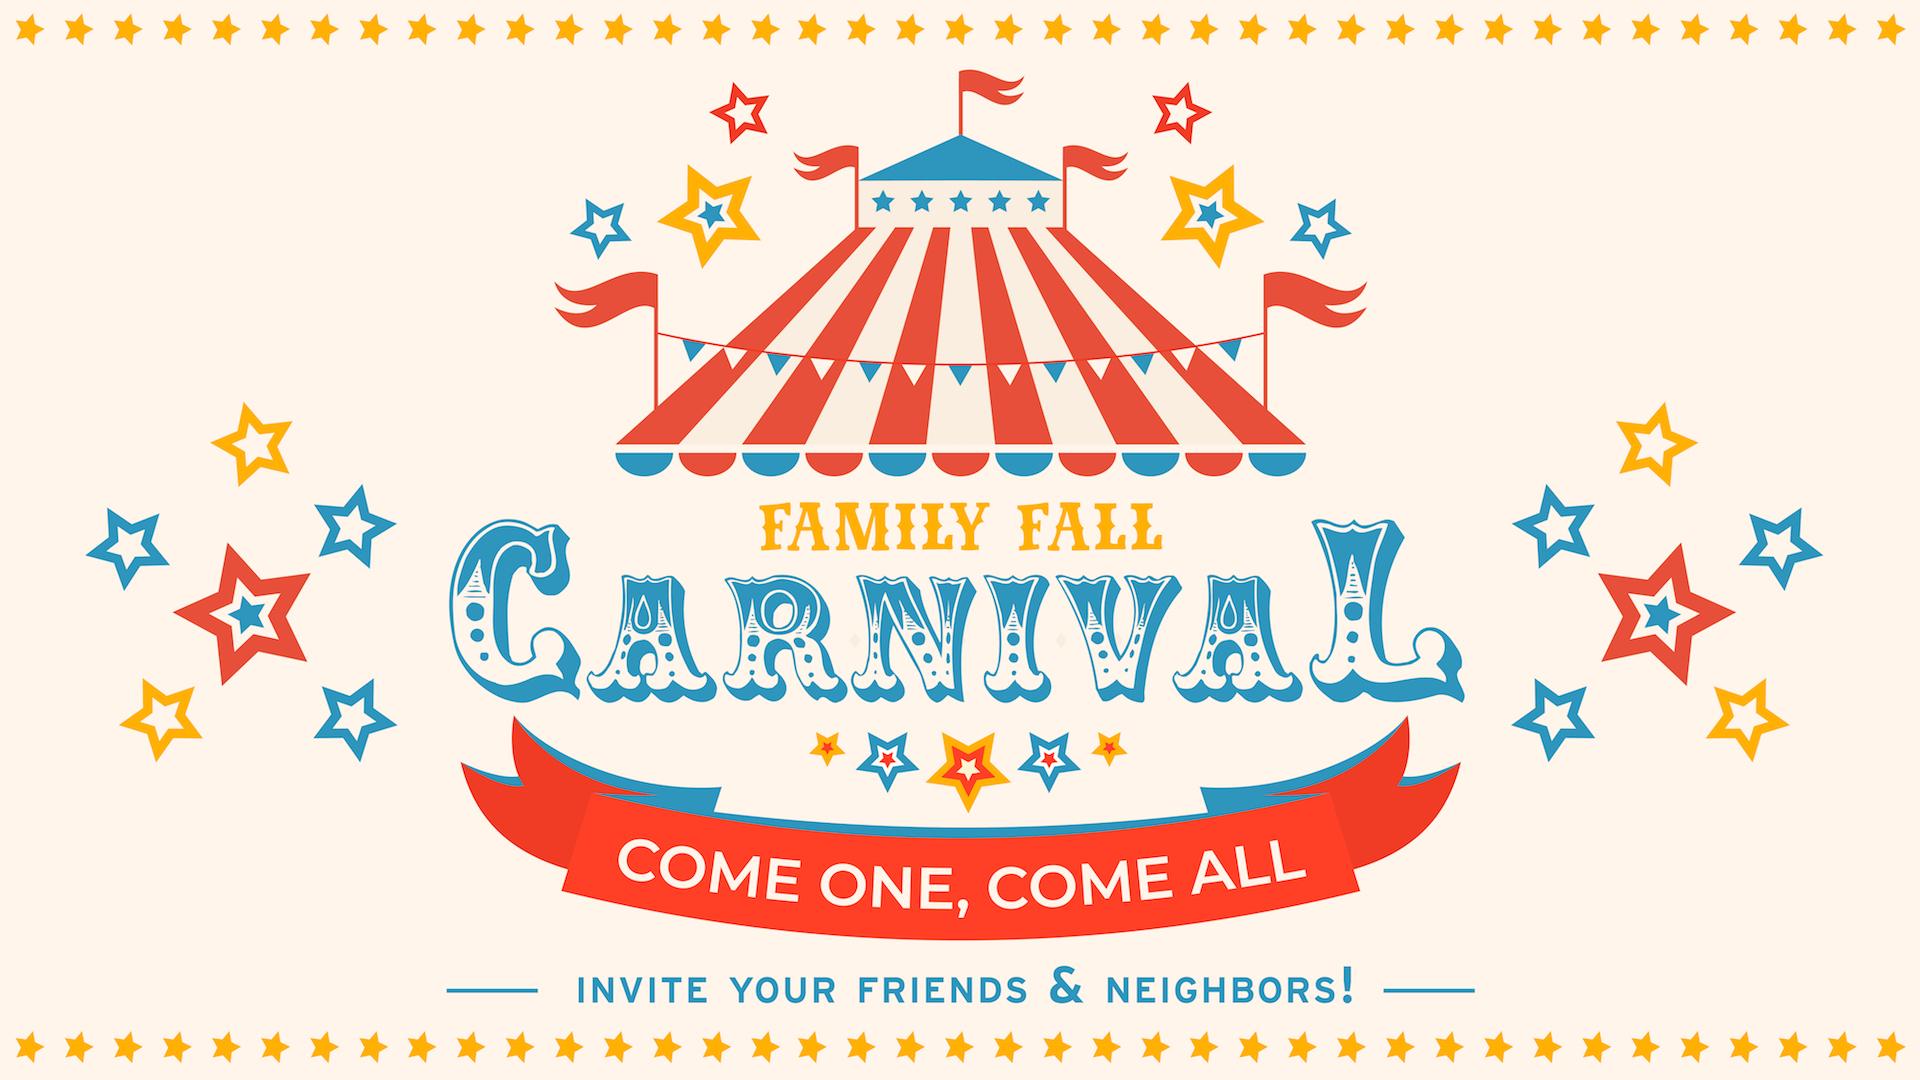 Family Fall Carnival.jpg